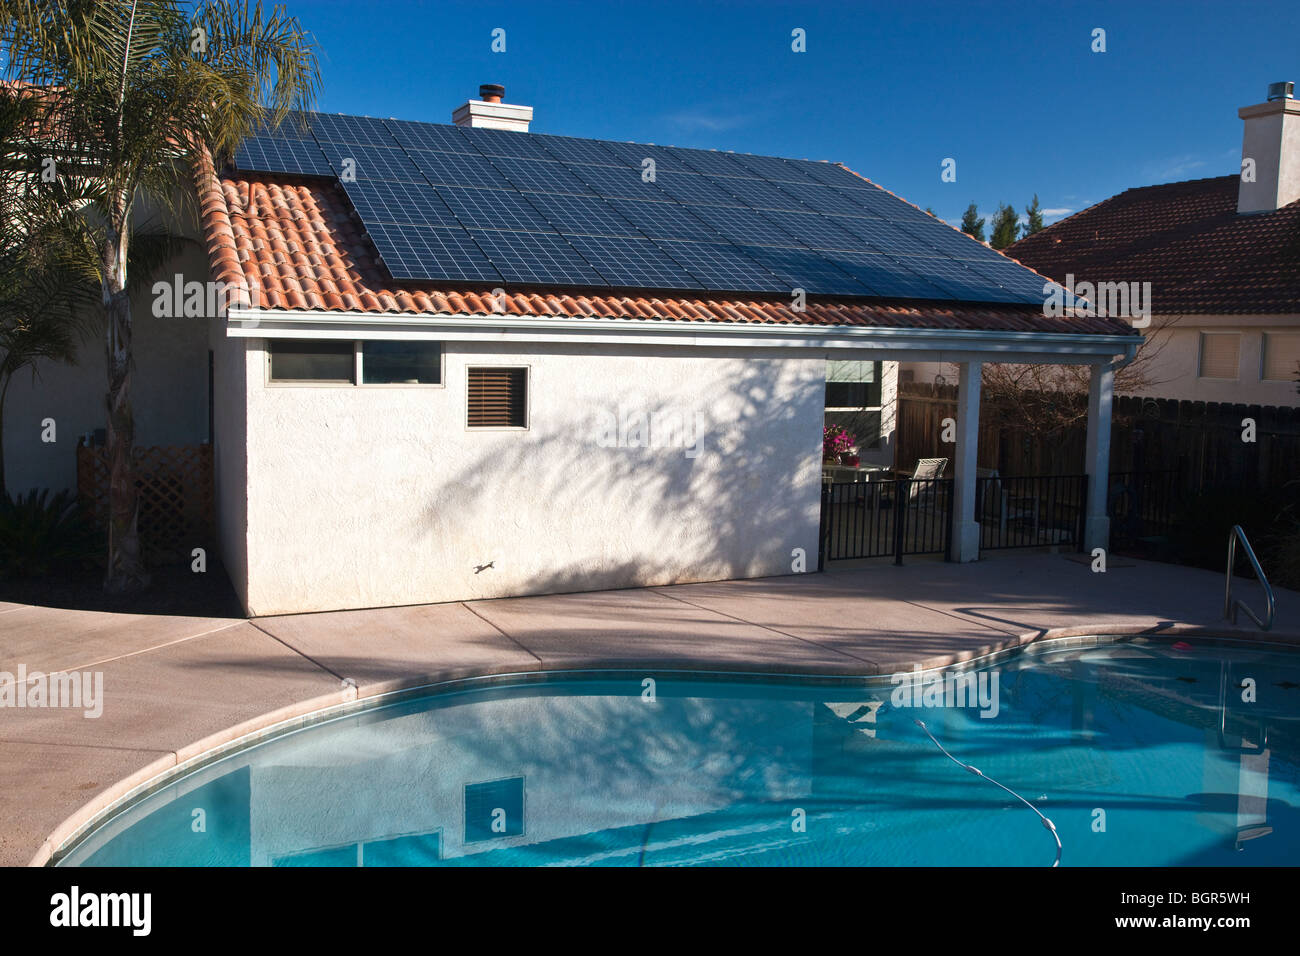 Solar Schalttafeln, Residenz Dach. Stockbild